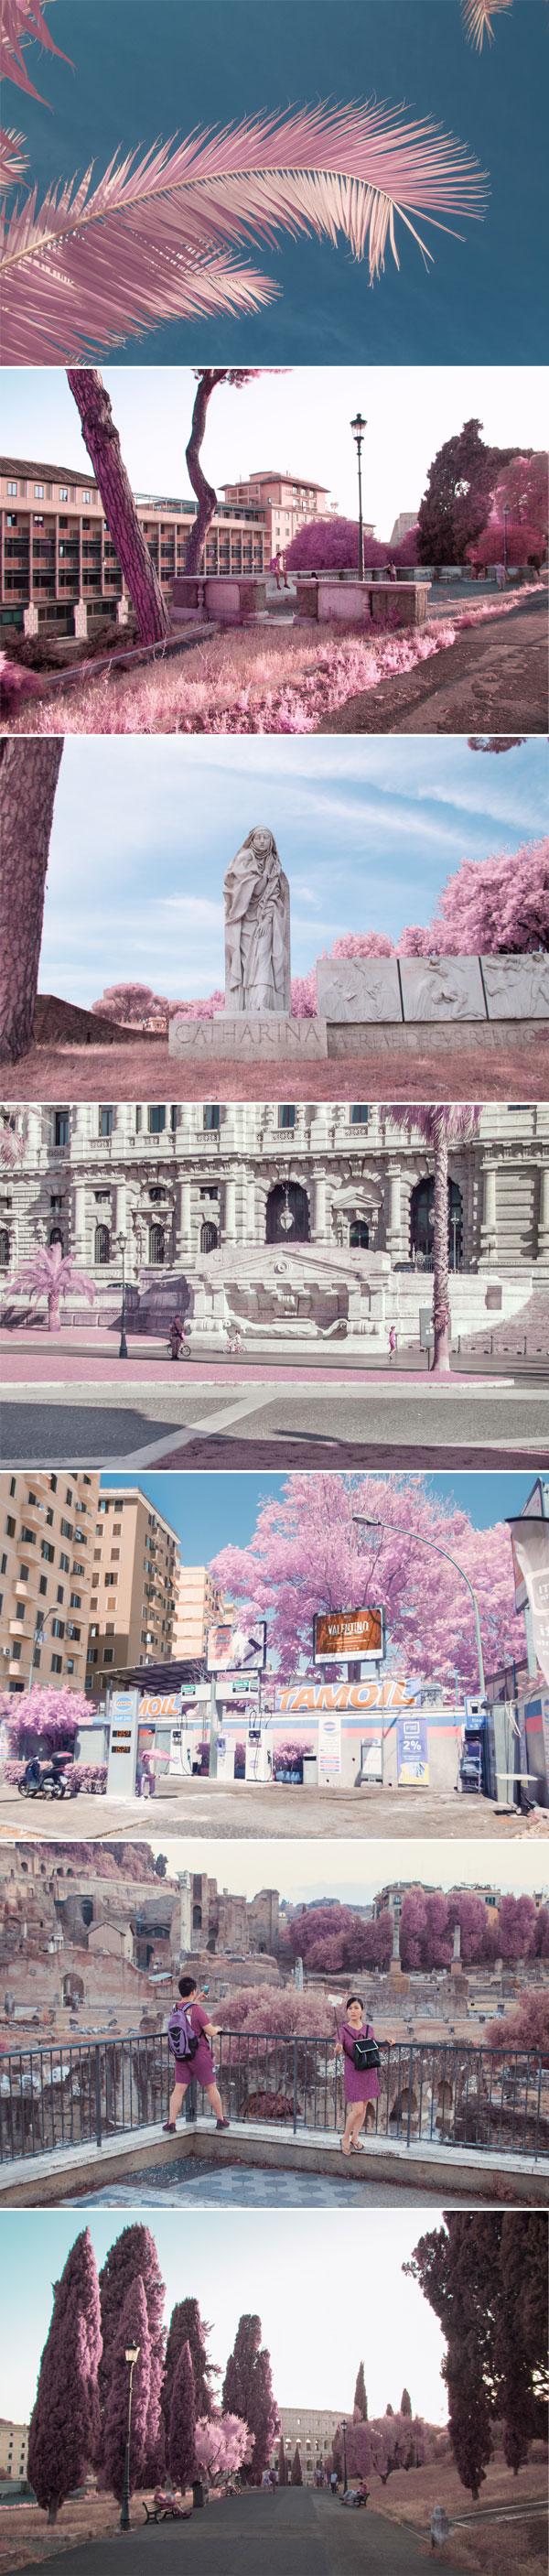 Rome in infrared | Milán Rácmolnár